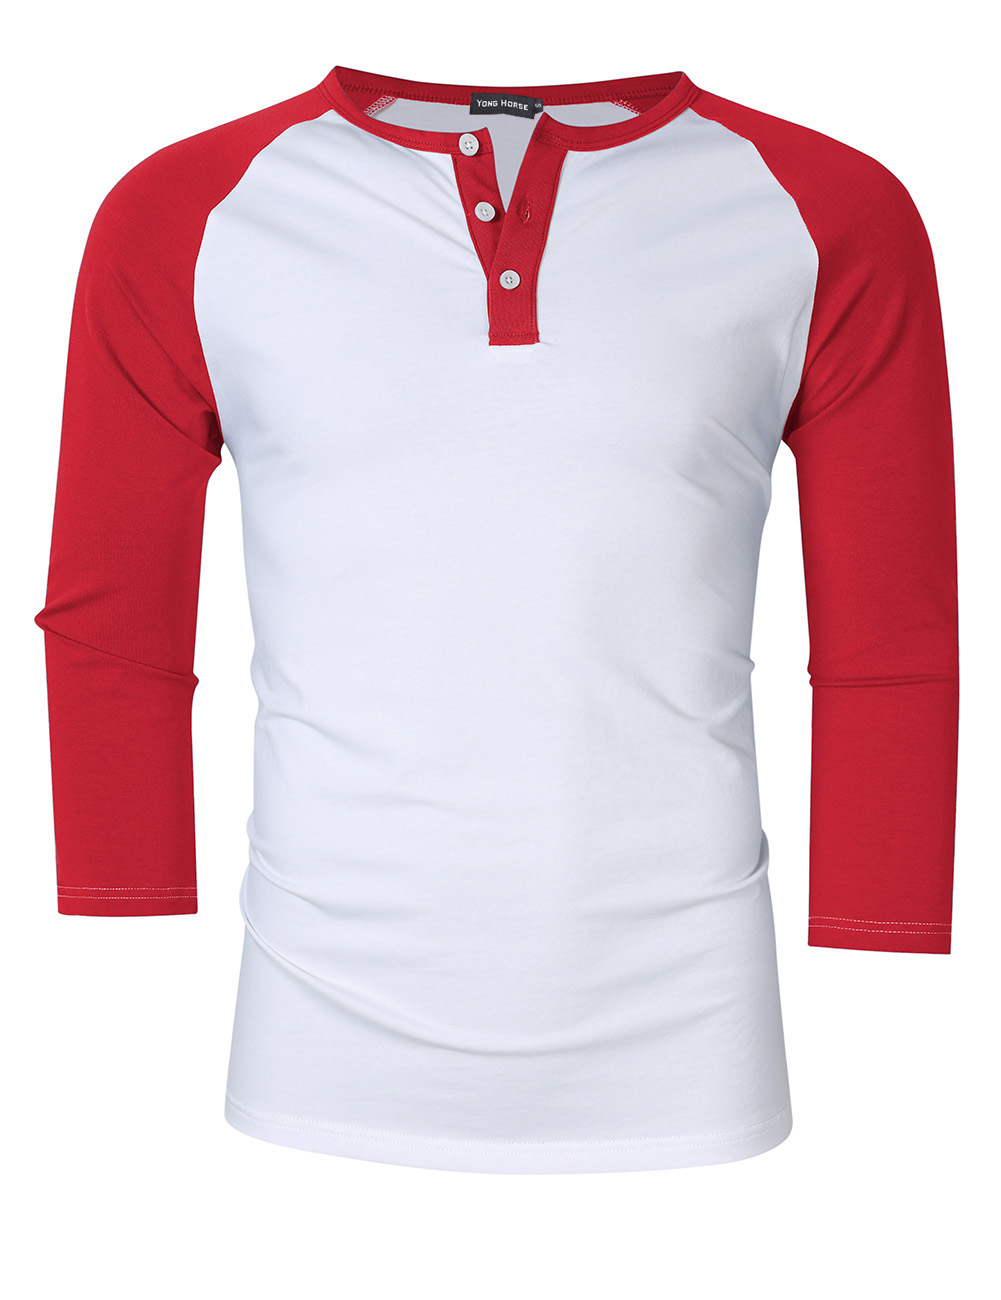 [US Direct] Yong Horse Men's Casual Slim Fit Baseball Raglan 3/4 Sleeve Henley Shirt White-red_2XL